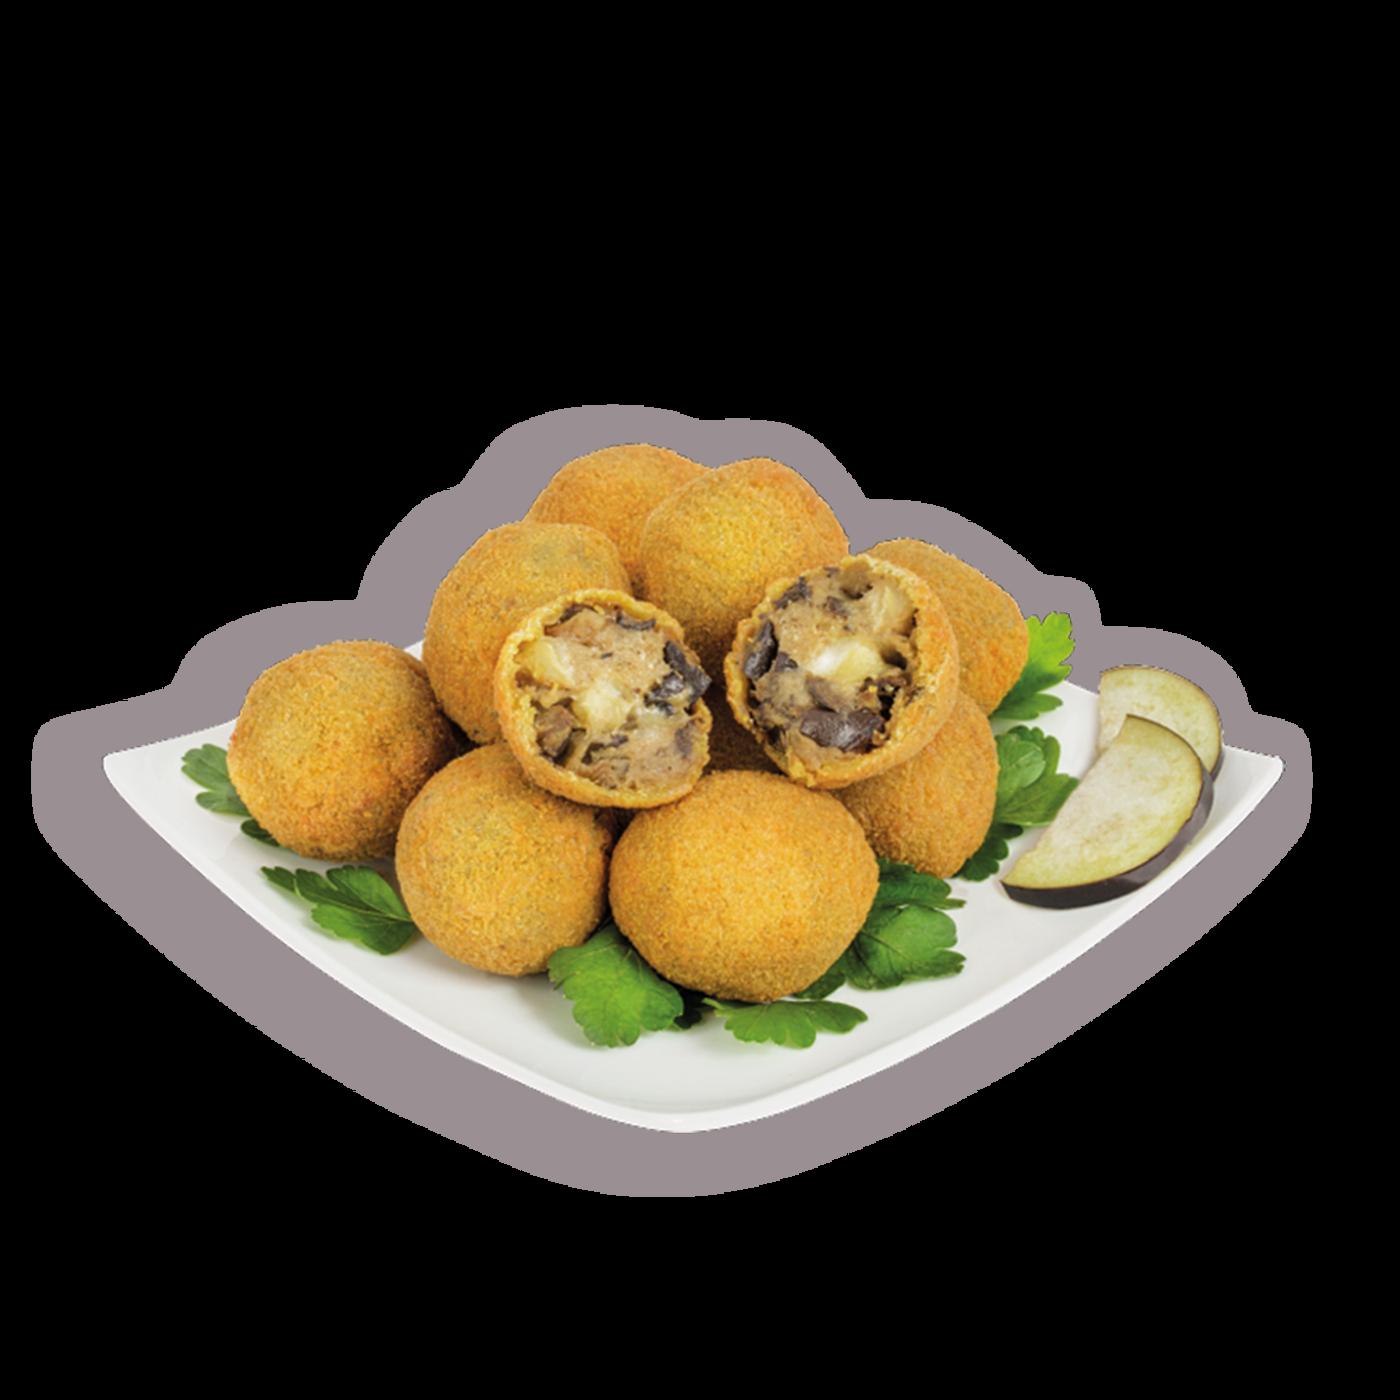 Polpettine de berenjena con mozzarella y provola ahumada